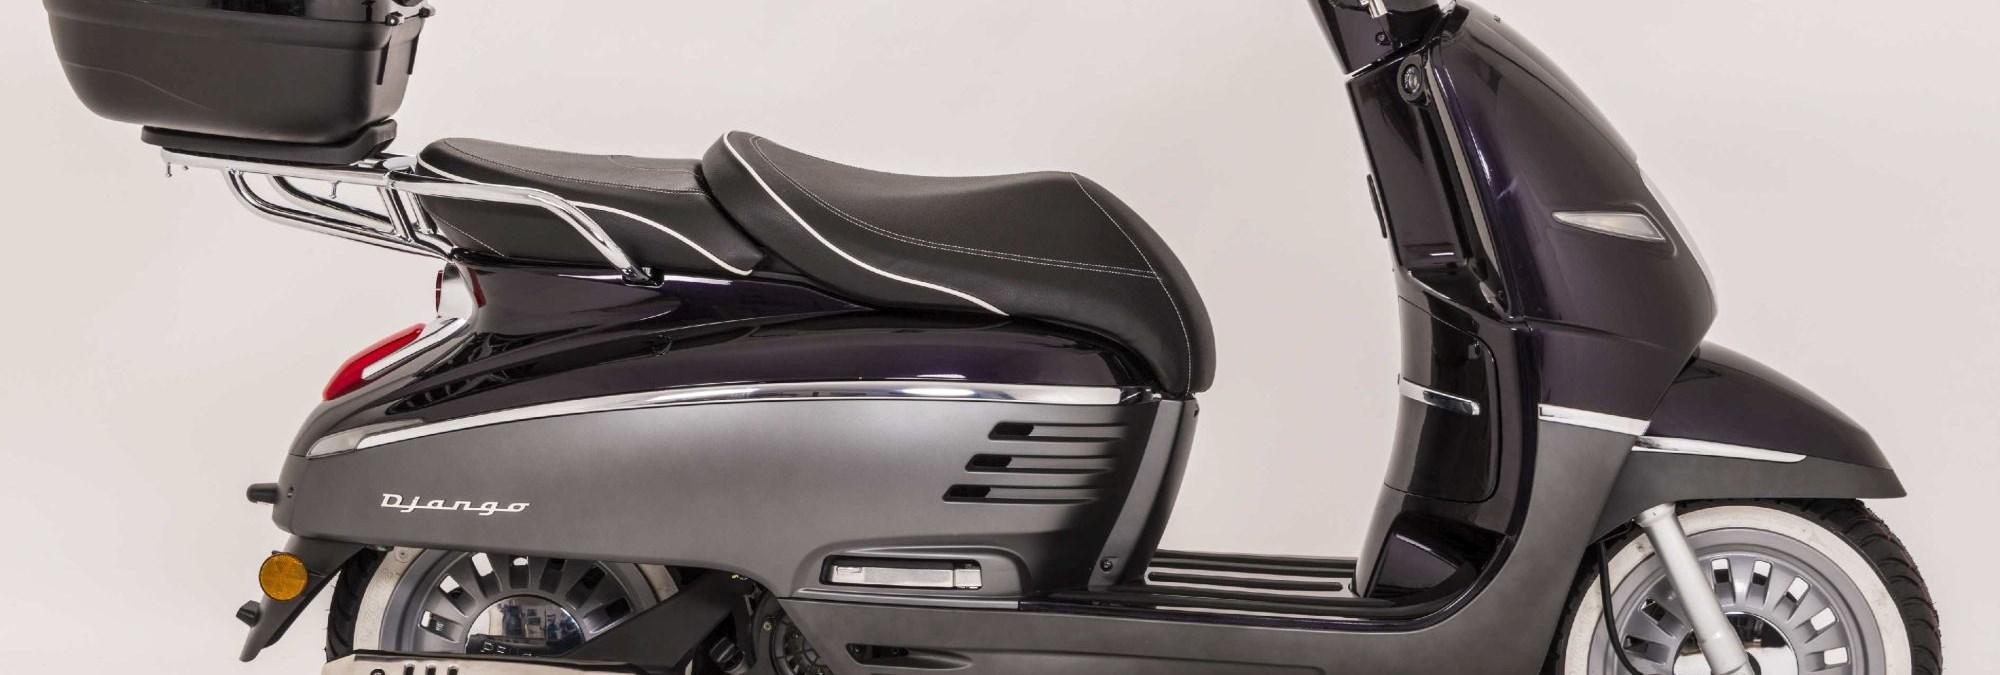 peugeot django 150 allure alle technischen daten zum modell django 150 allure von peugeot. Black Bedroom Furniture Sets. Home Design Ideas